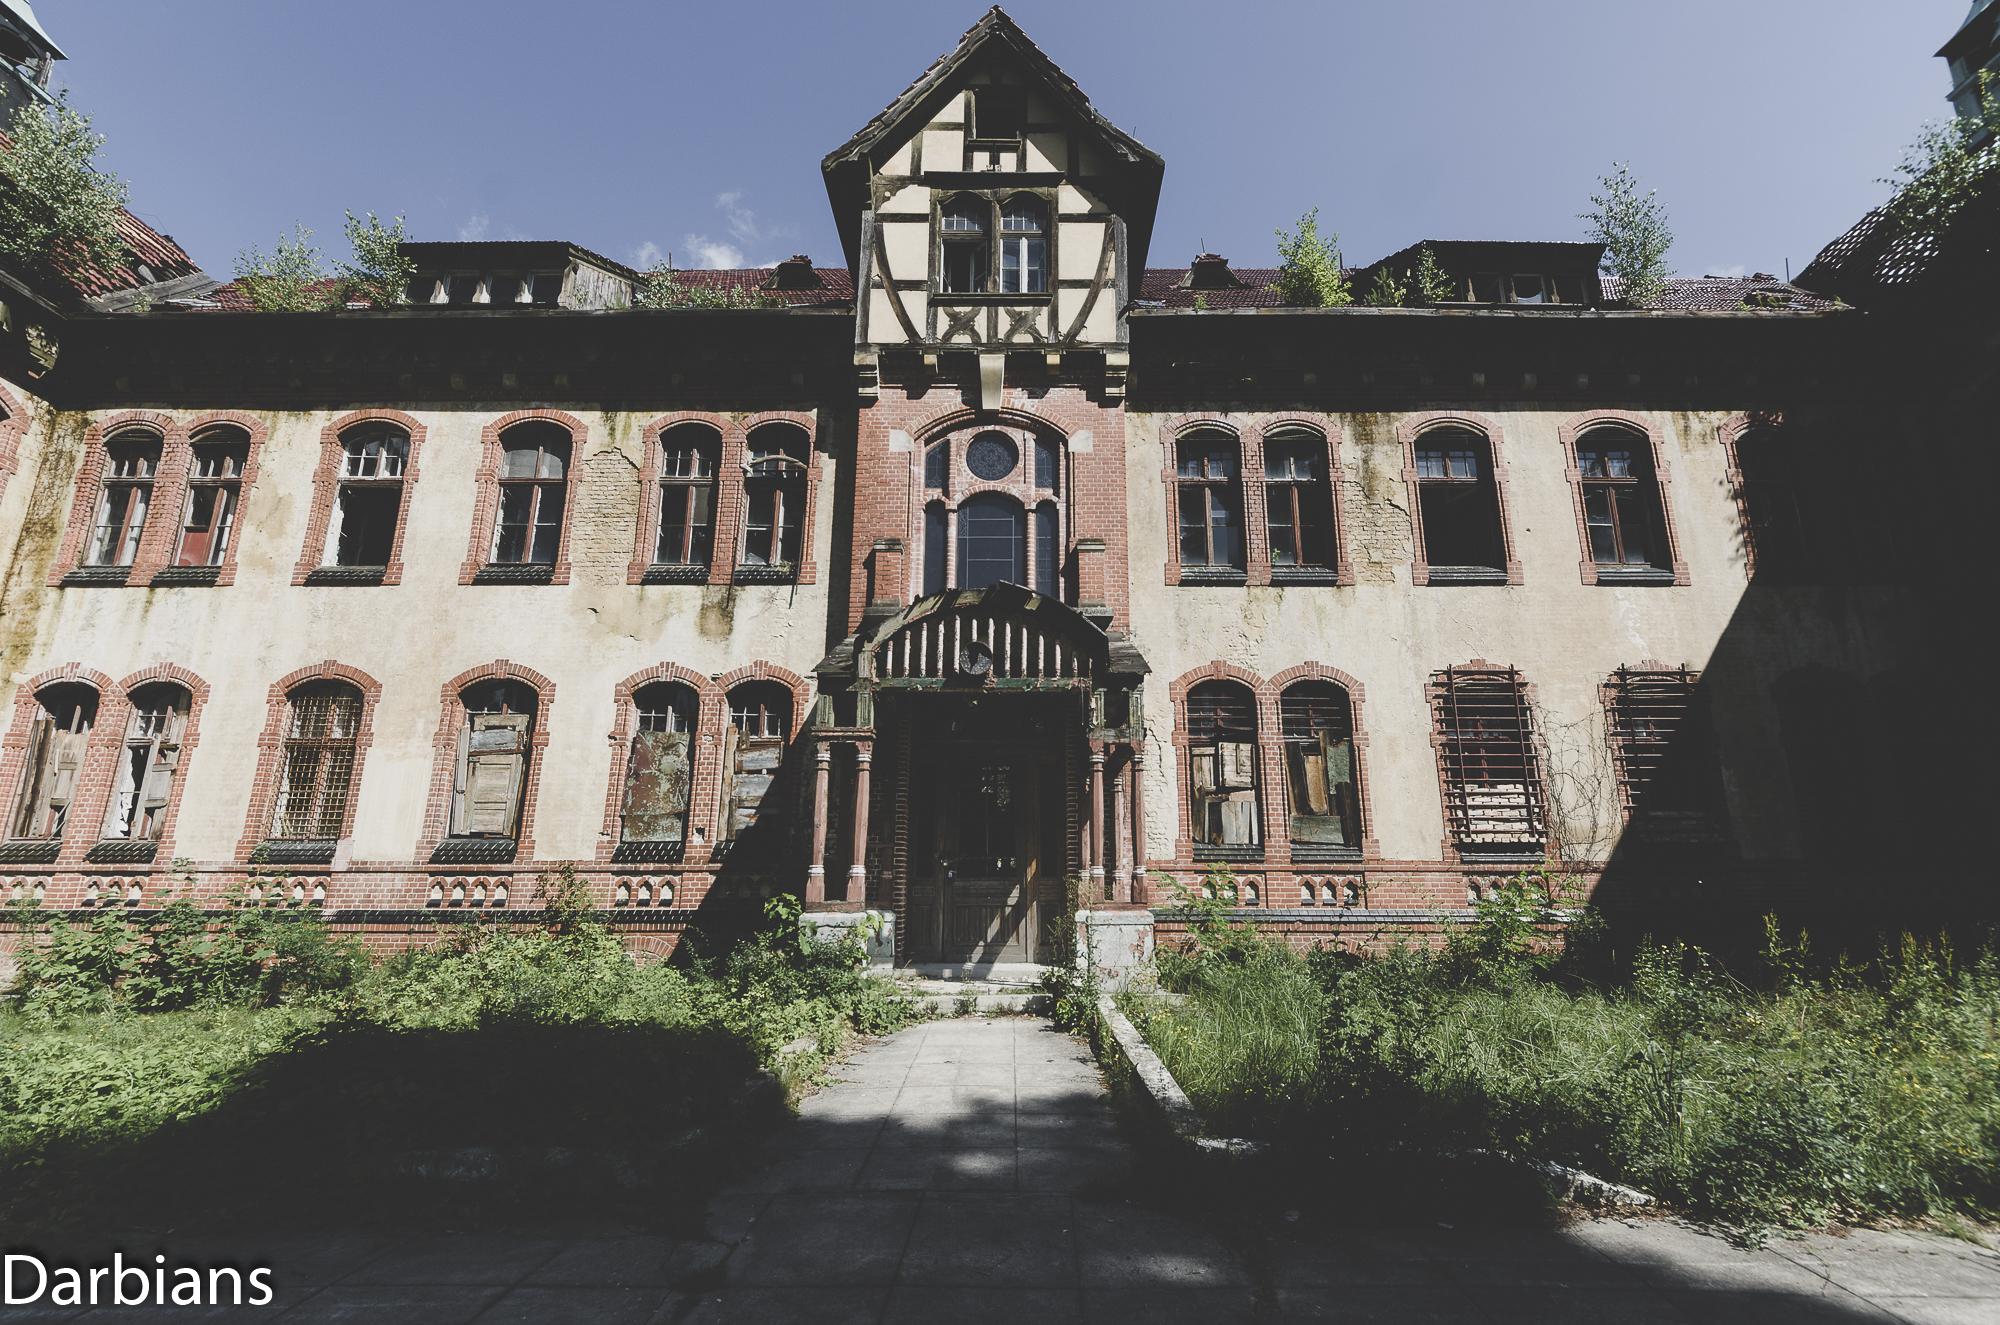 Beelitz Heilstätten Abandoned Sanatorium: Administration block